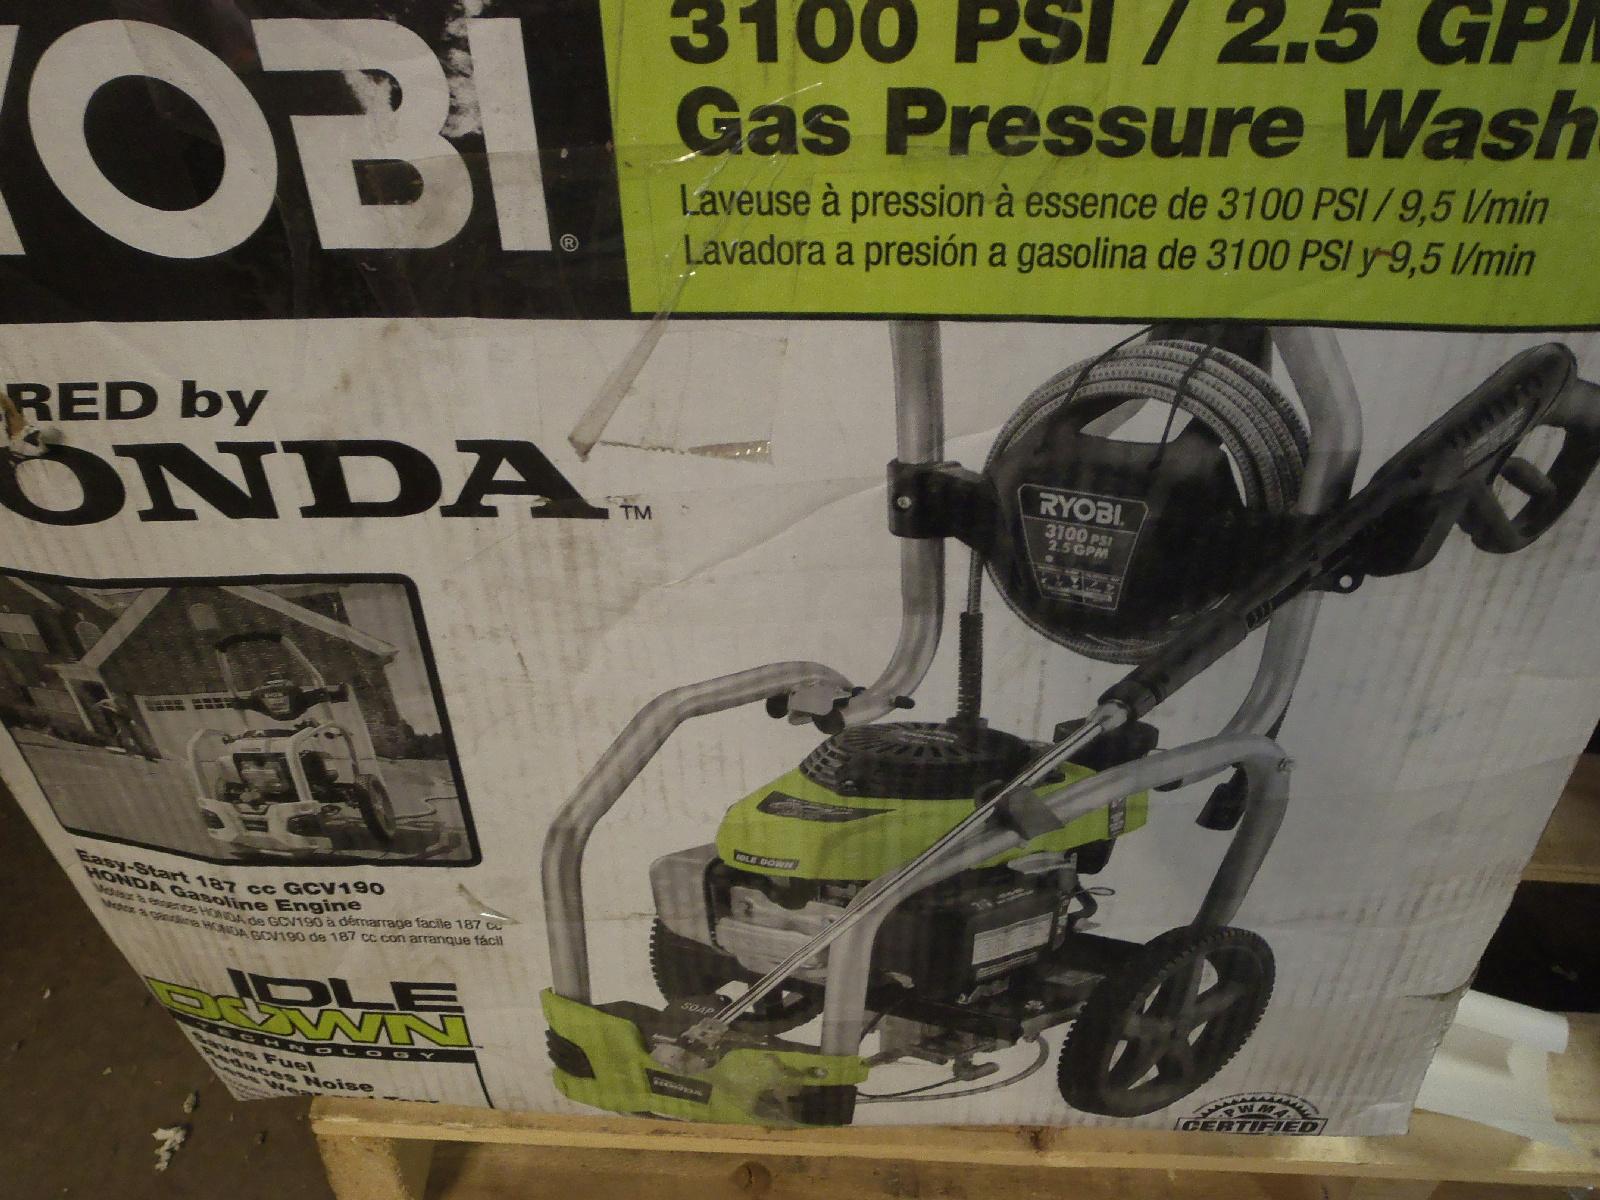 ryobi 3100 psi 2.5 gpm pressure washer manual